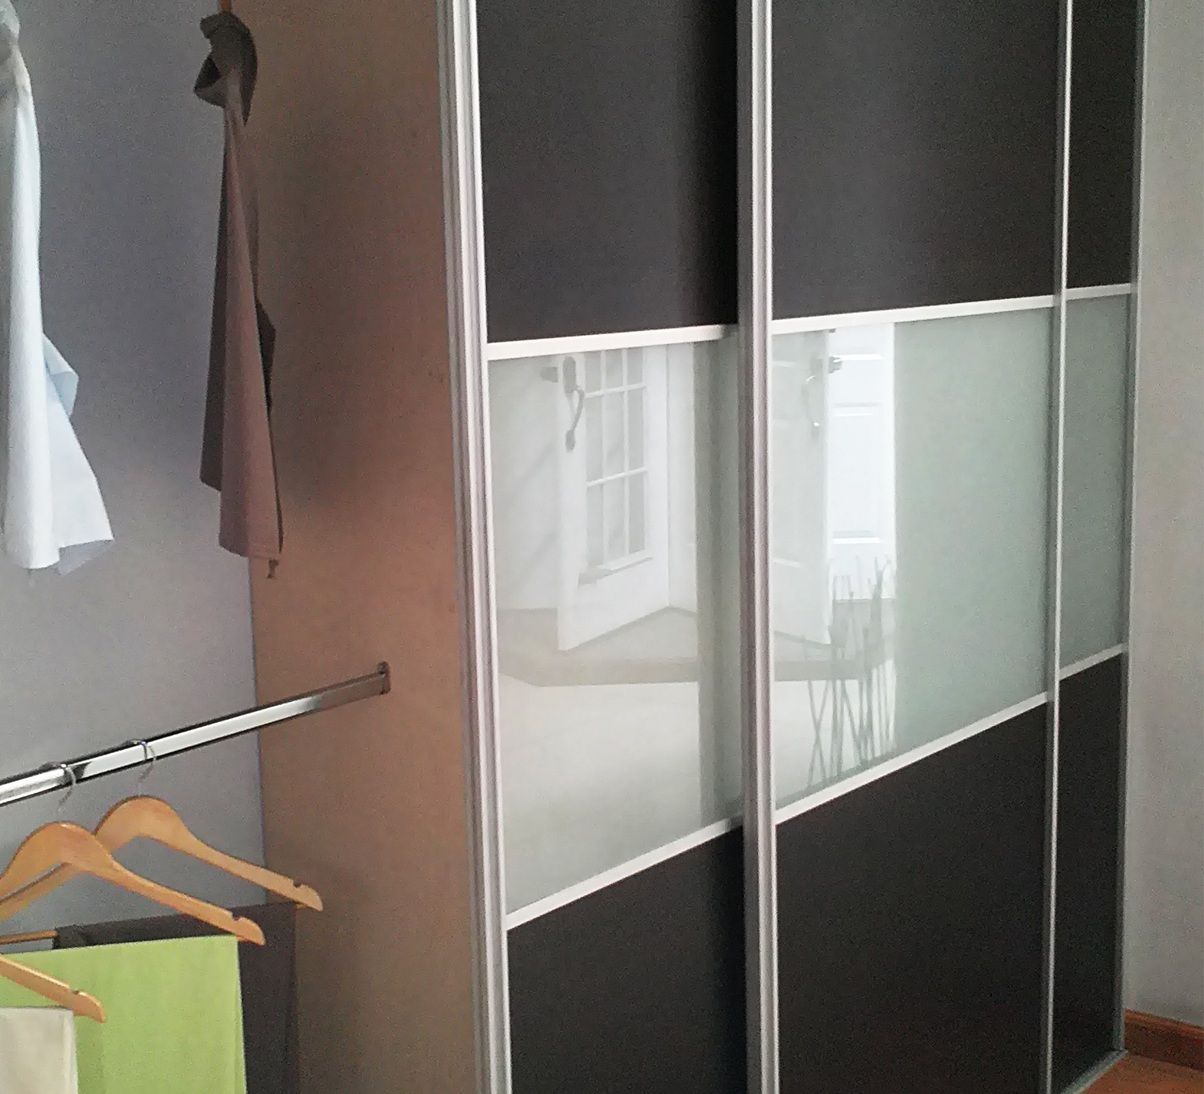 Perfil siena sistema de perfiles de aluminio para puertas for Puertas de aluminio para dormitorio